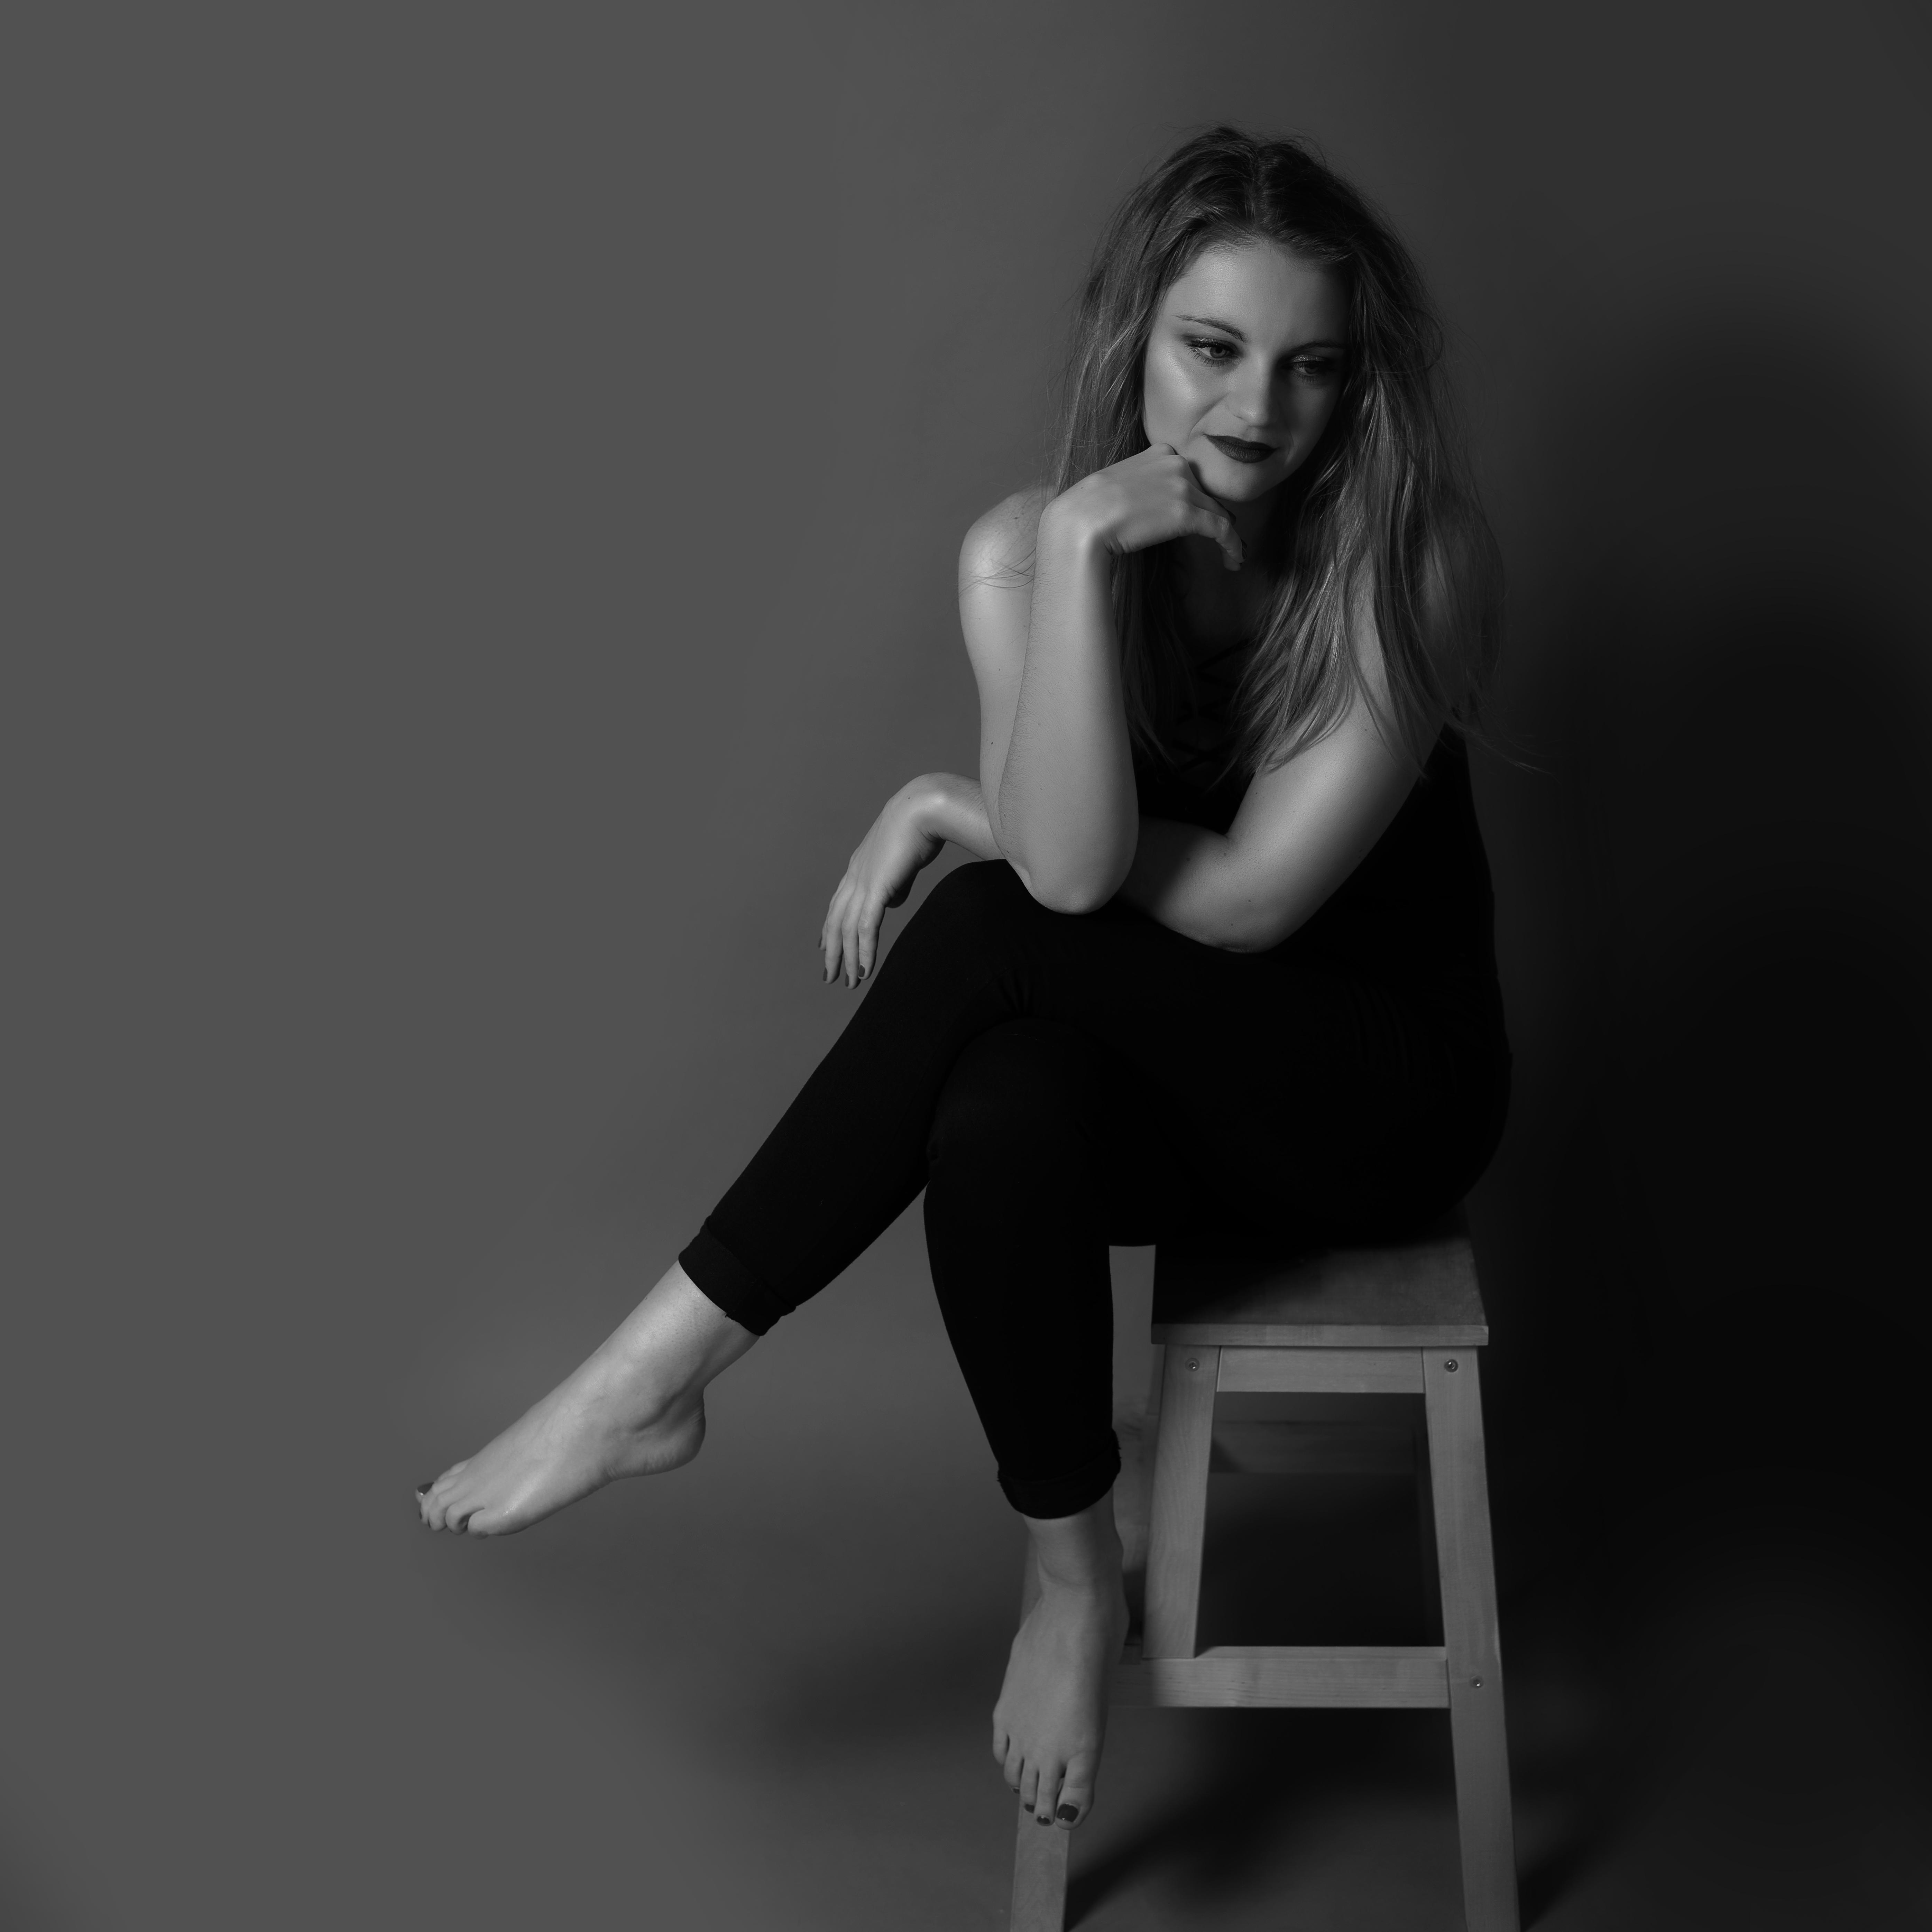 Essex Portraits